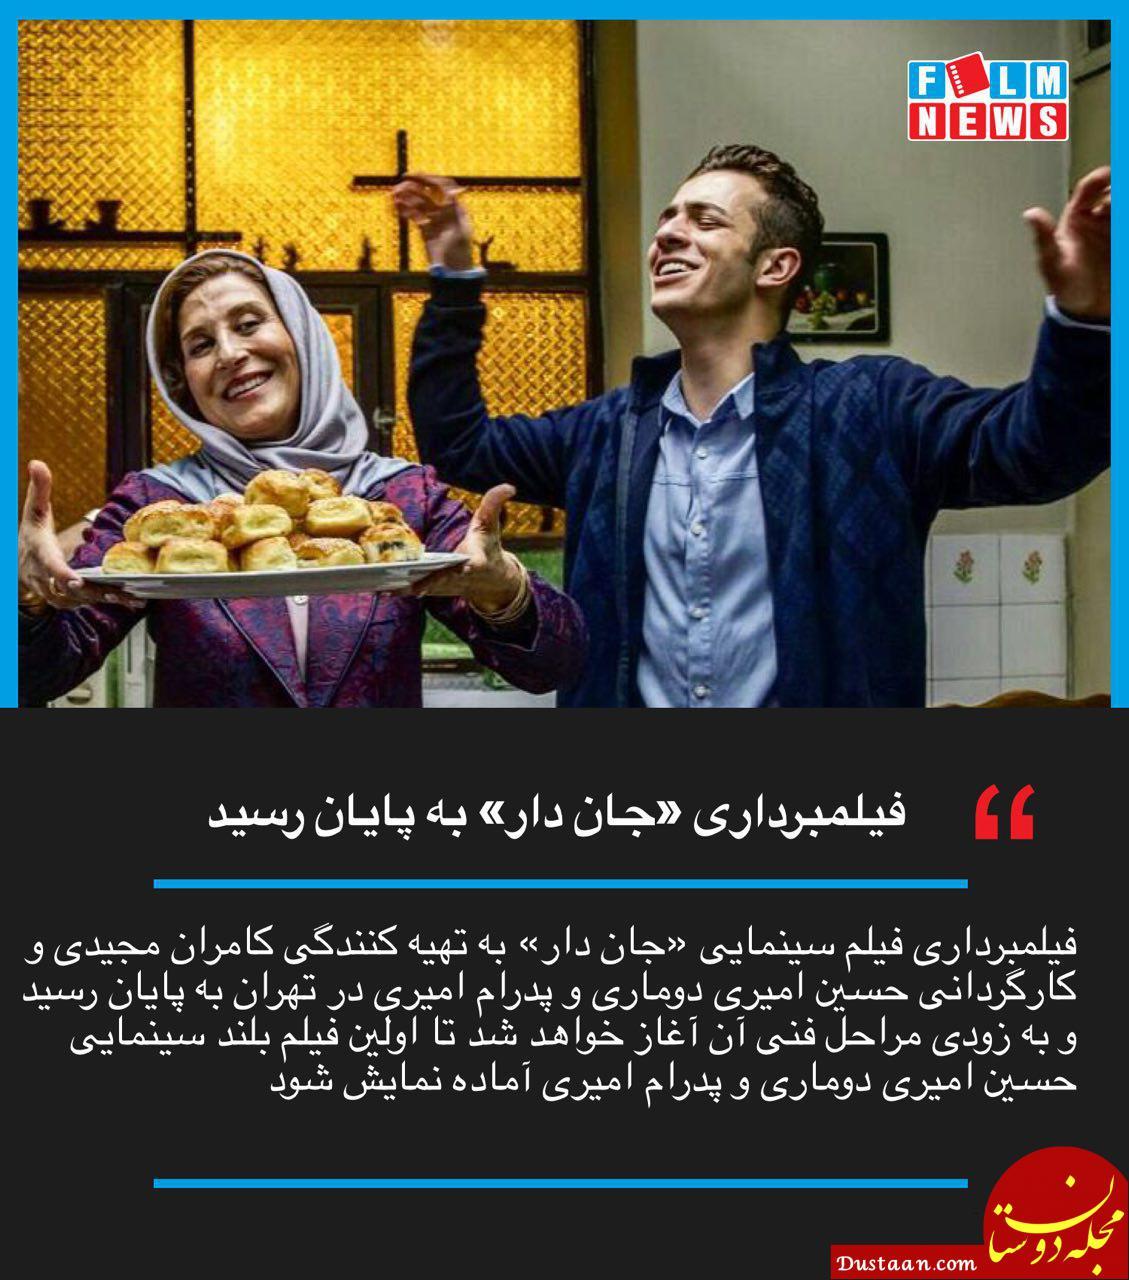 www.dustaan.com فیلمبردارى فیلم سینمایى «جان دار» به پایان رسید +عکس